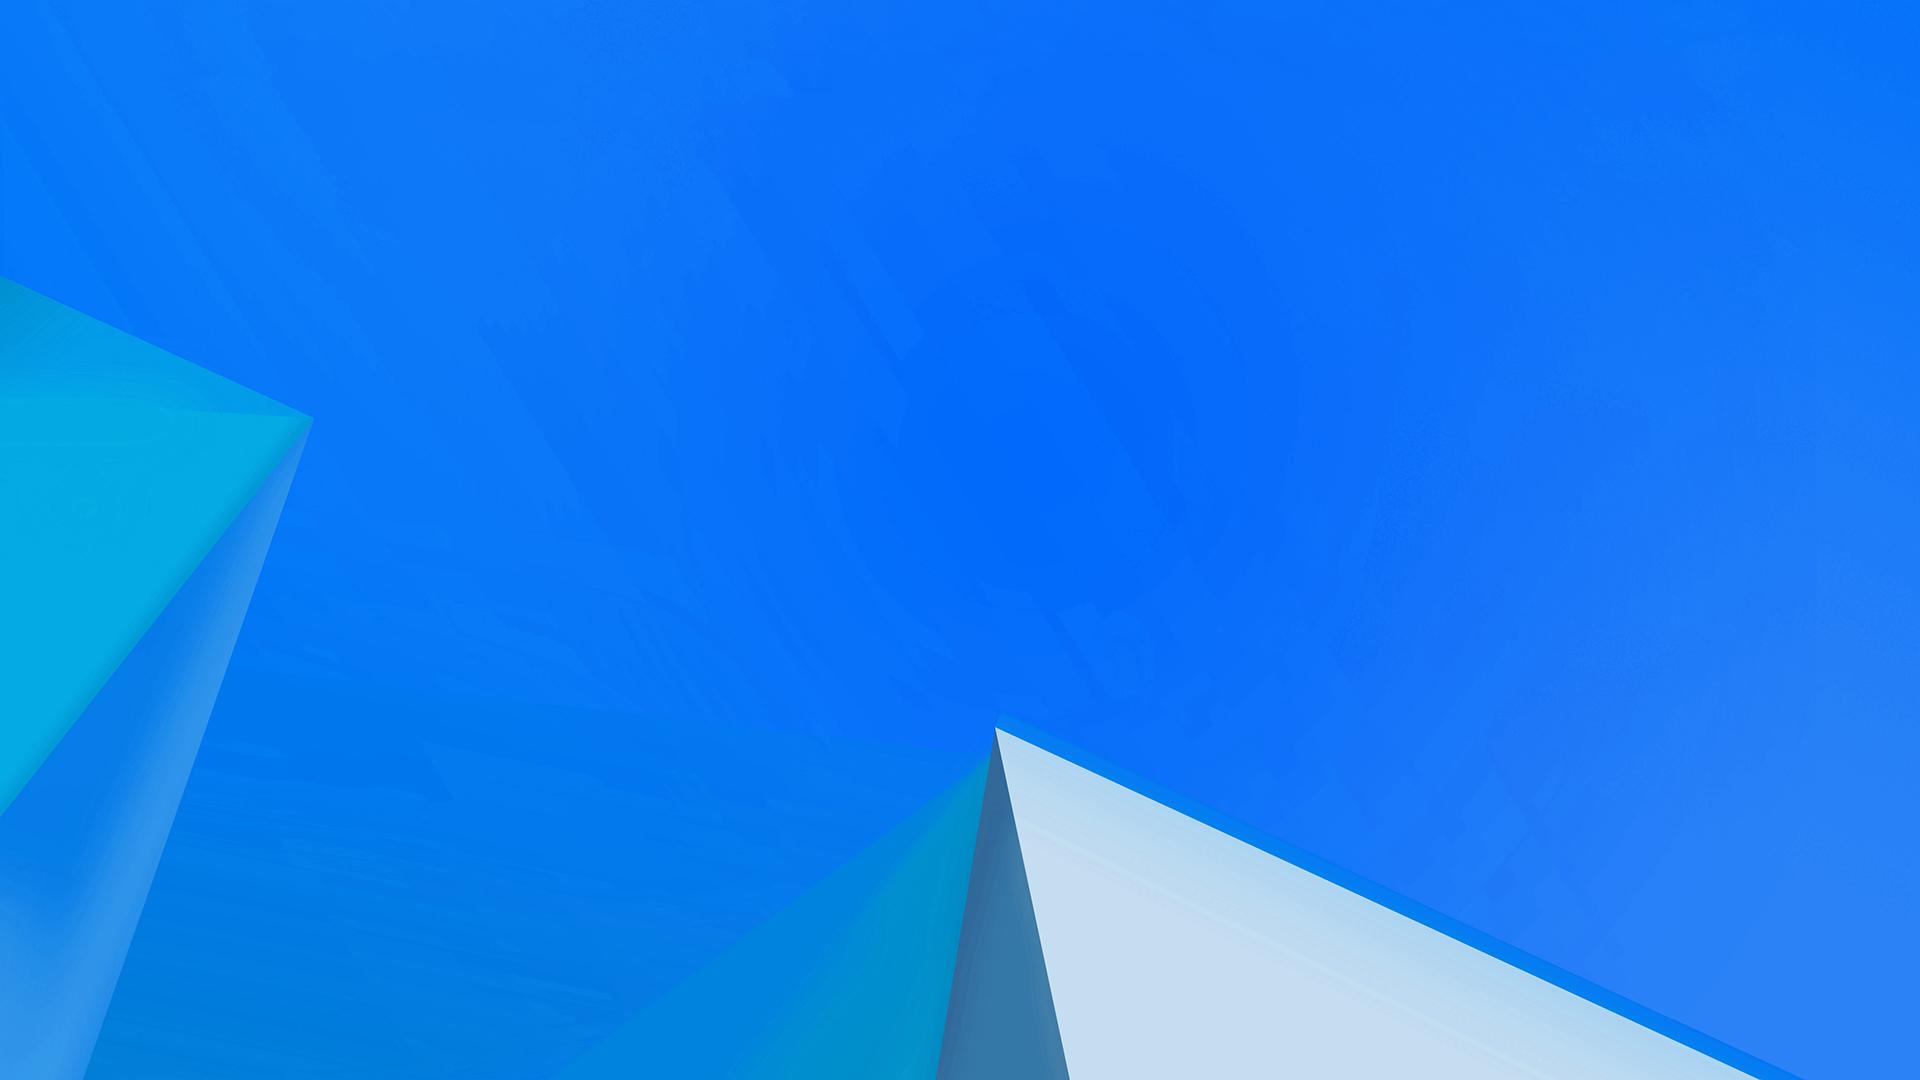 windows 8.1 blue wallpaper - wallpapersafari